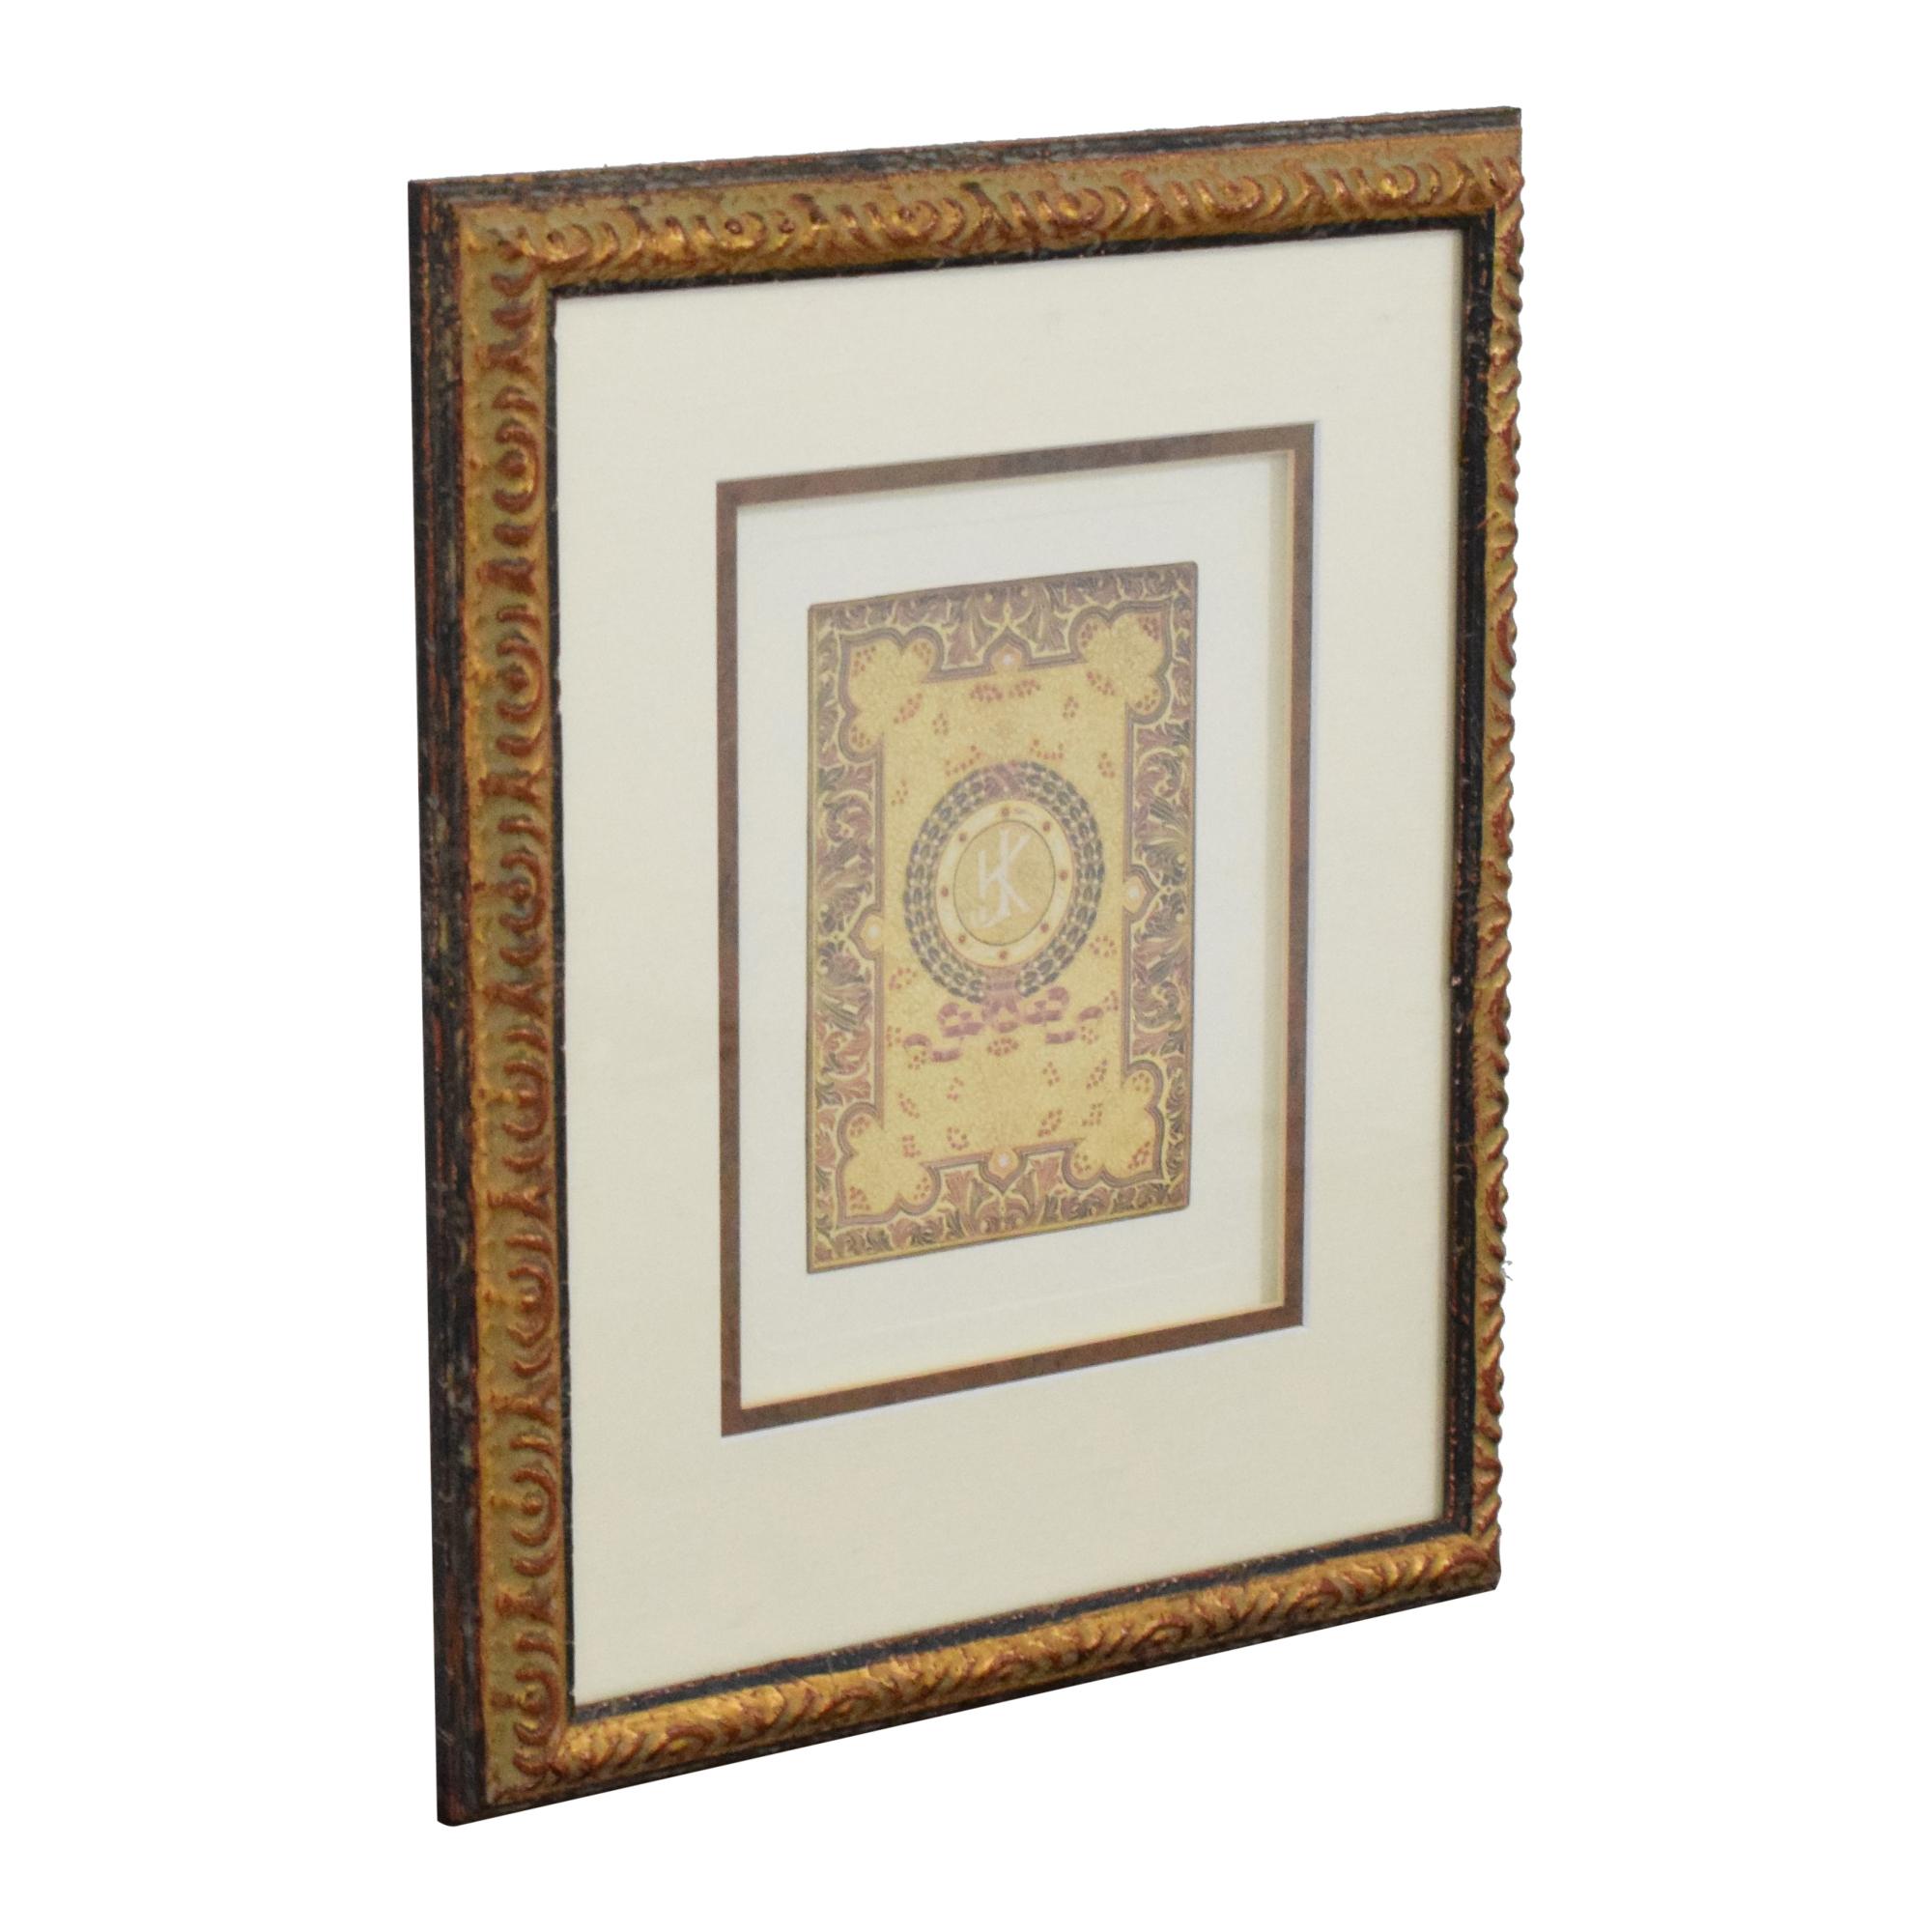 buy Ethan Allen Ethan Allen Jeweled Boxes Wall Art online